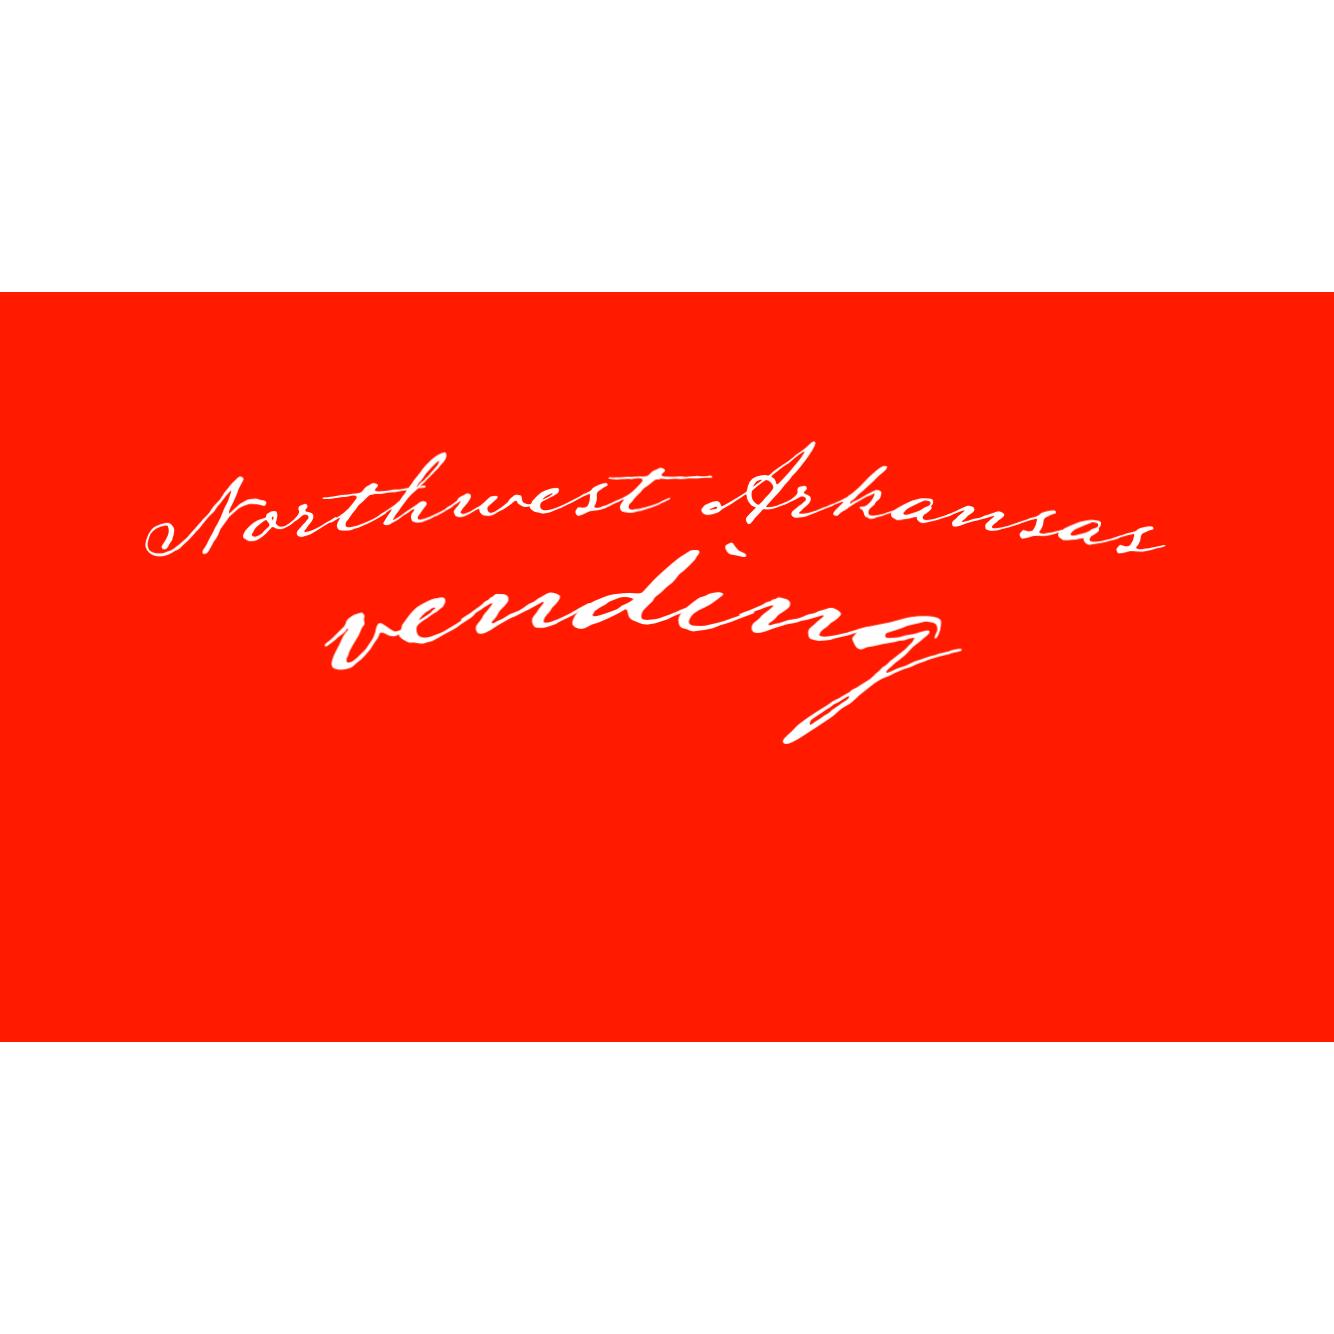 Northwest arkansas speed dating llc